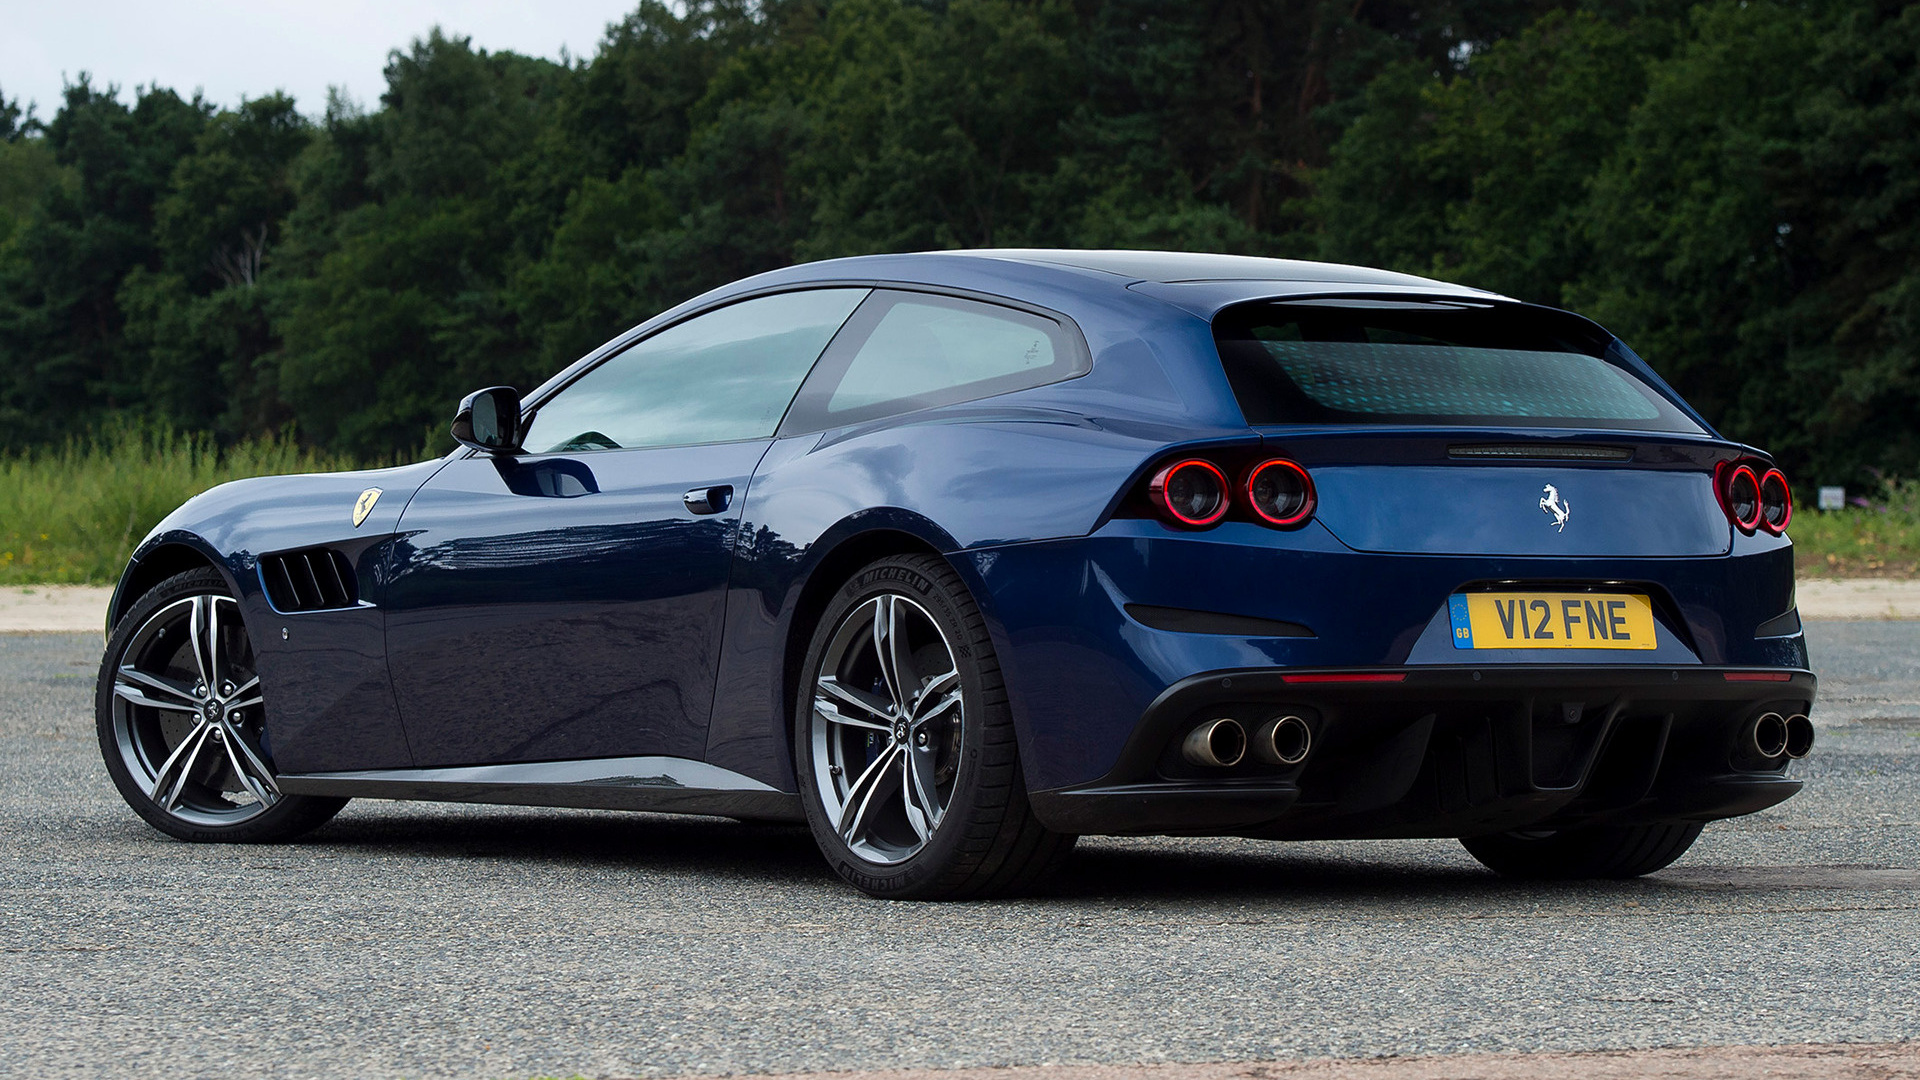 2016 Ferrari GTC4Lusso (UK)